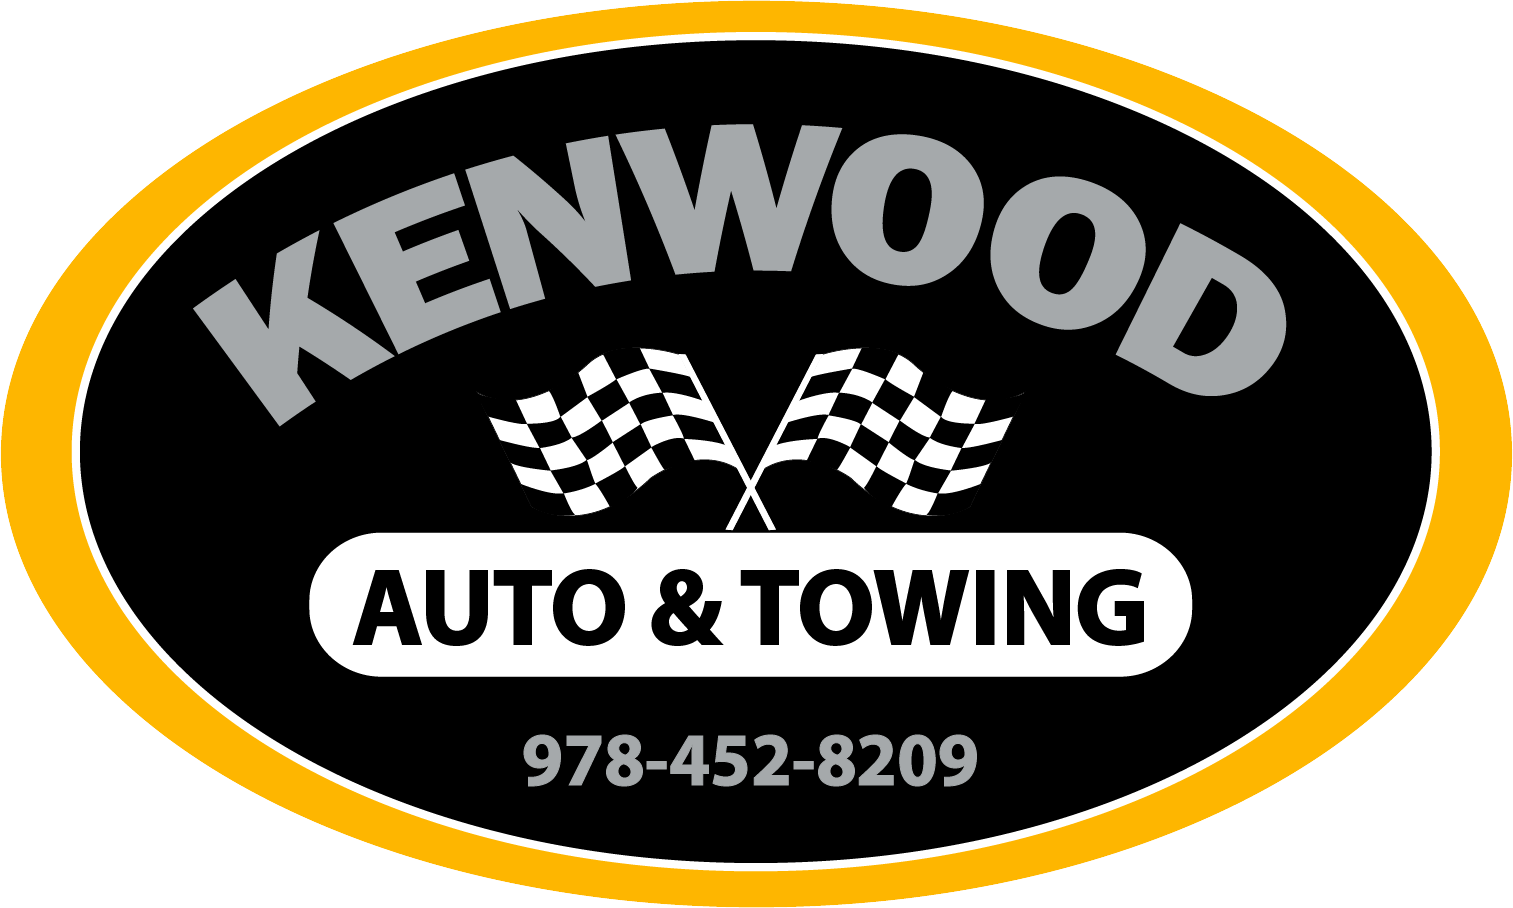 Kenwood Auto